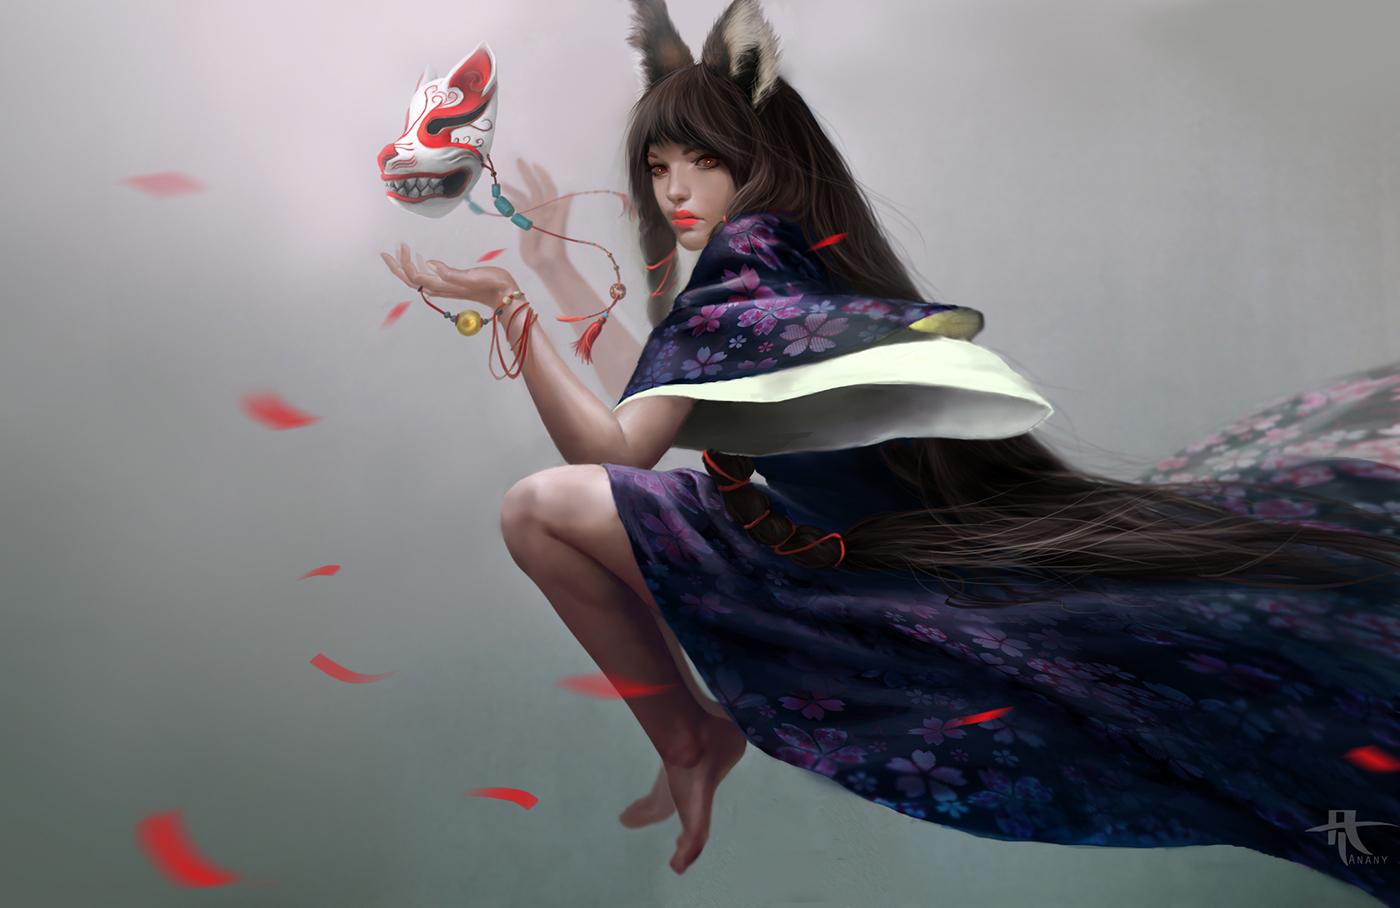 Asian mythology kitsune fox women